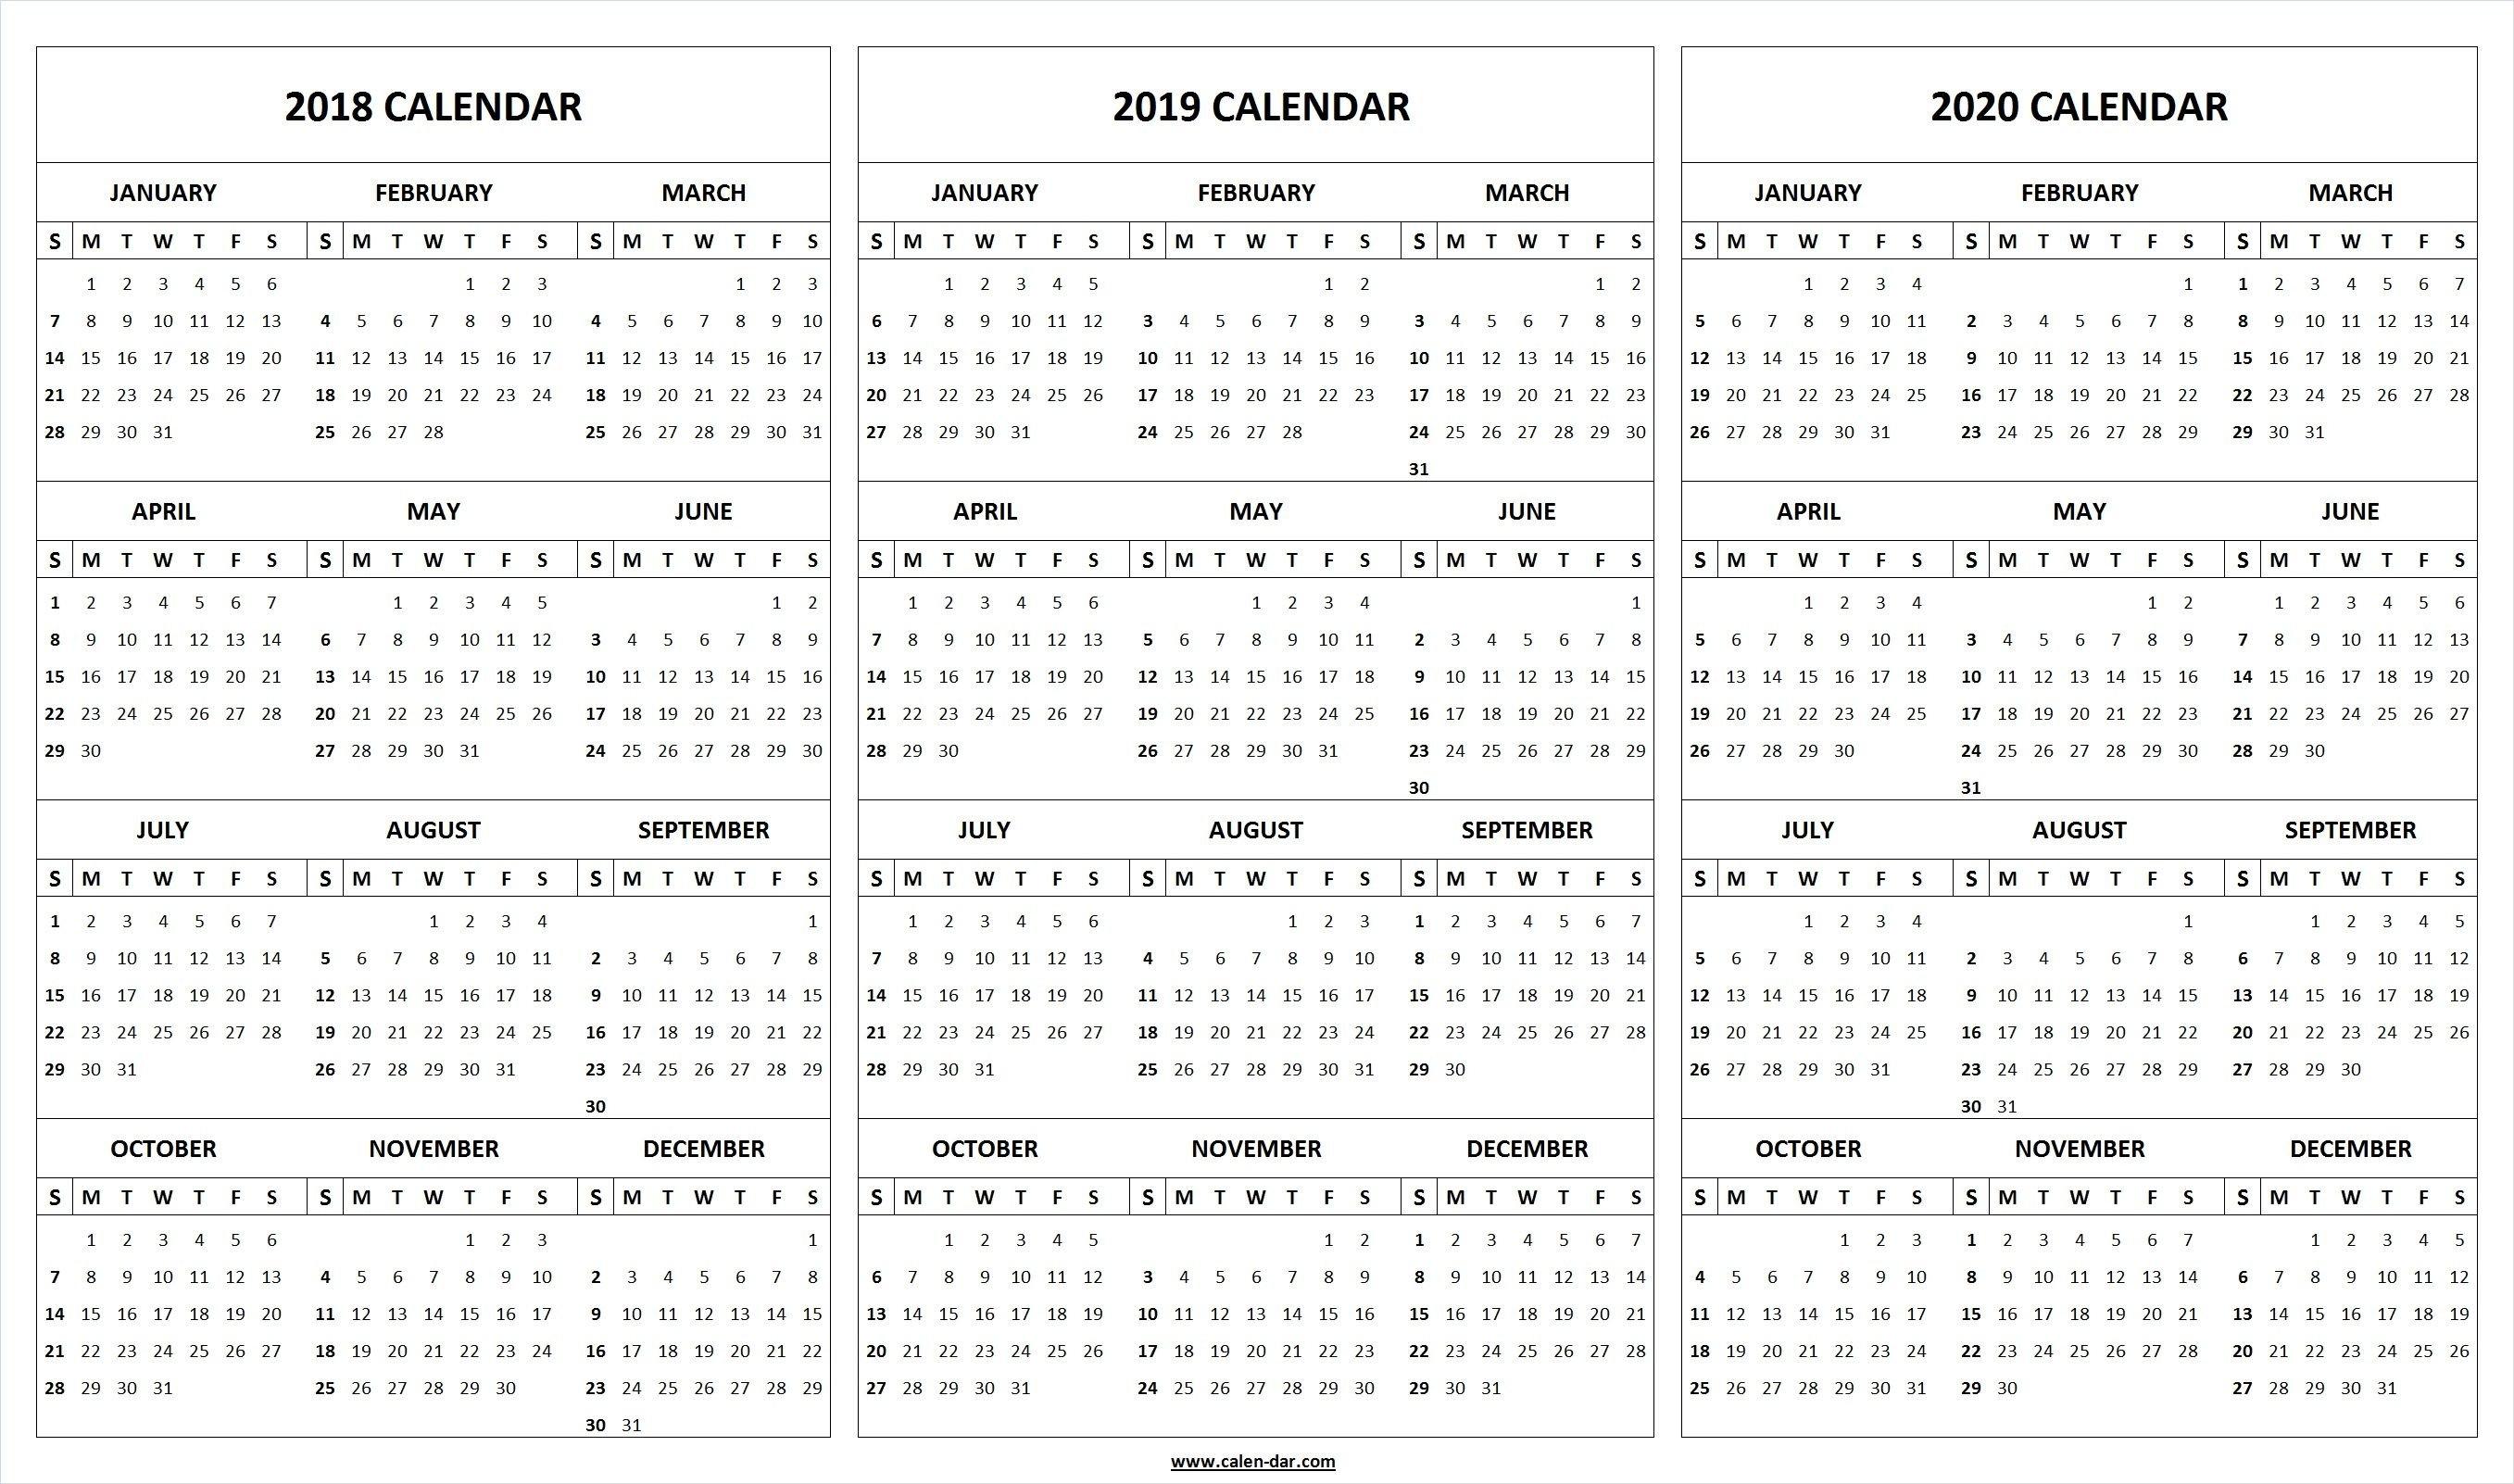 Print Blank 2018 2019 2020 Calendar Template | Organize! | Pinterest Calendar 2019 Microsoft